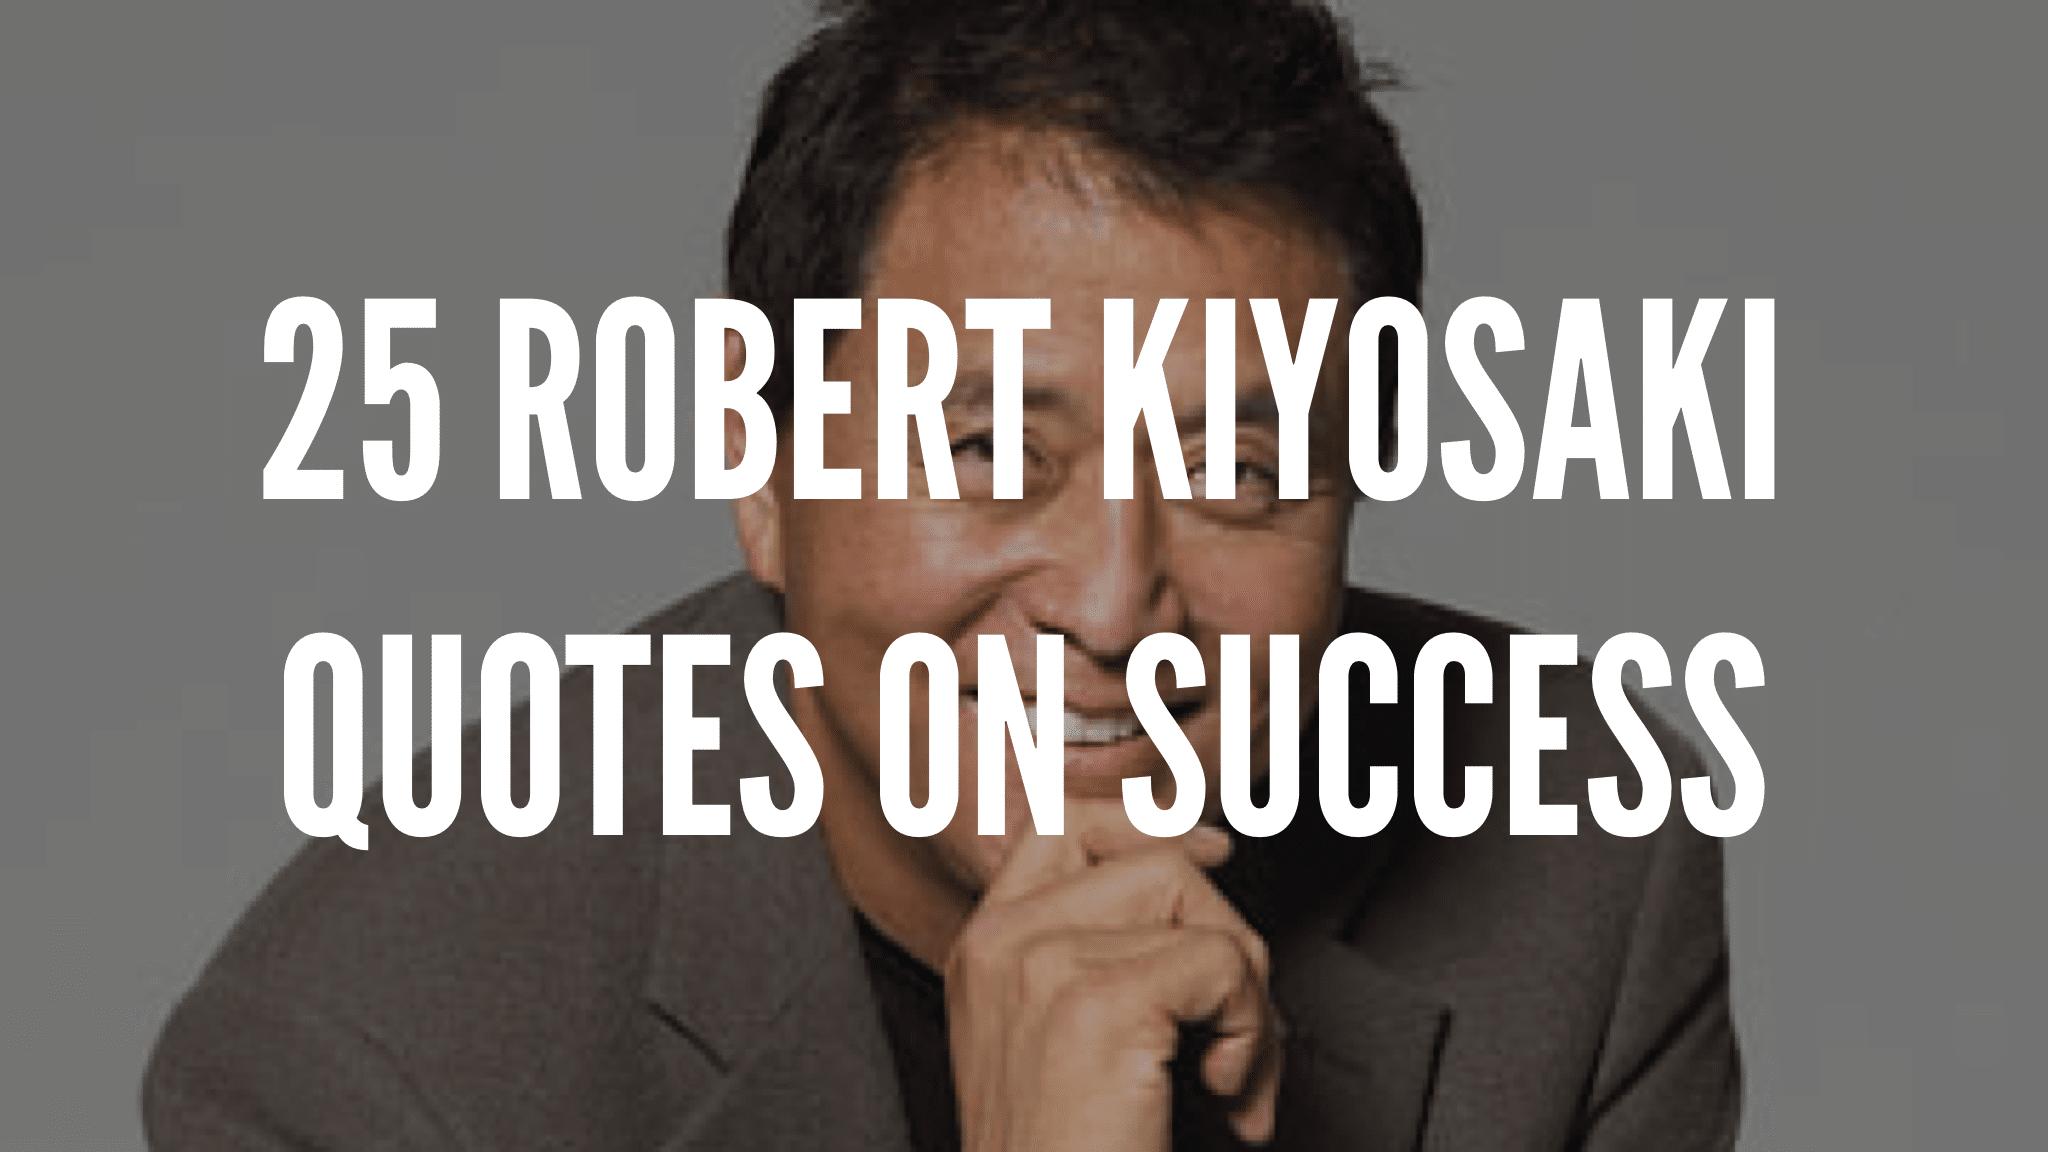 25 Robert Kiyosaki Quotes On Success